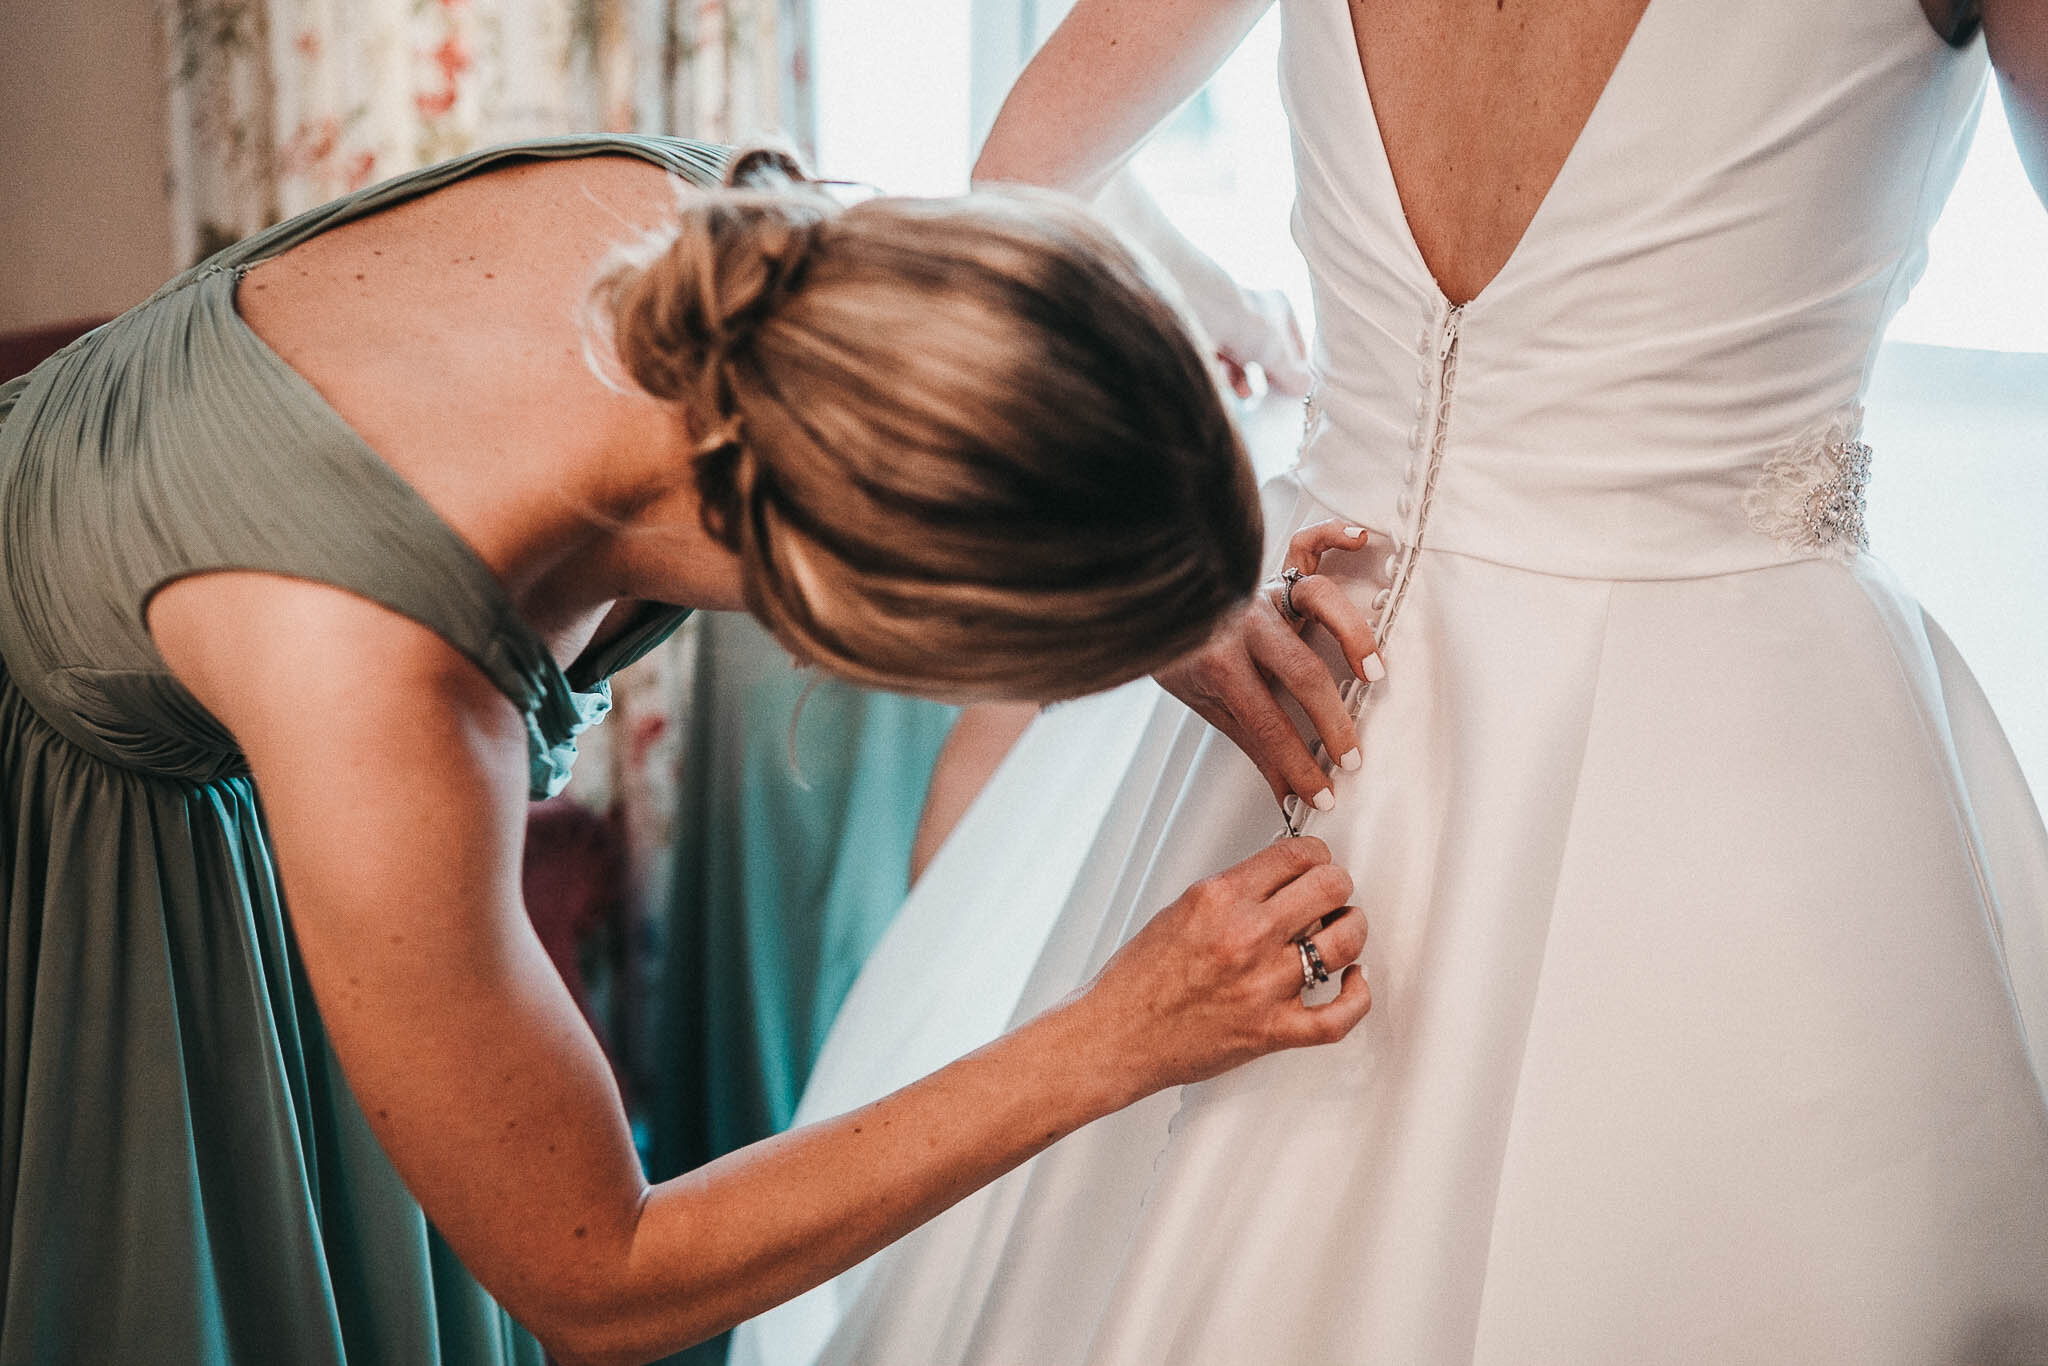 bride-having-dress-adjusted-by-bridesmaid